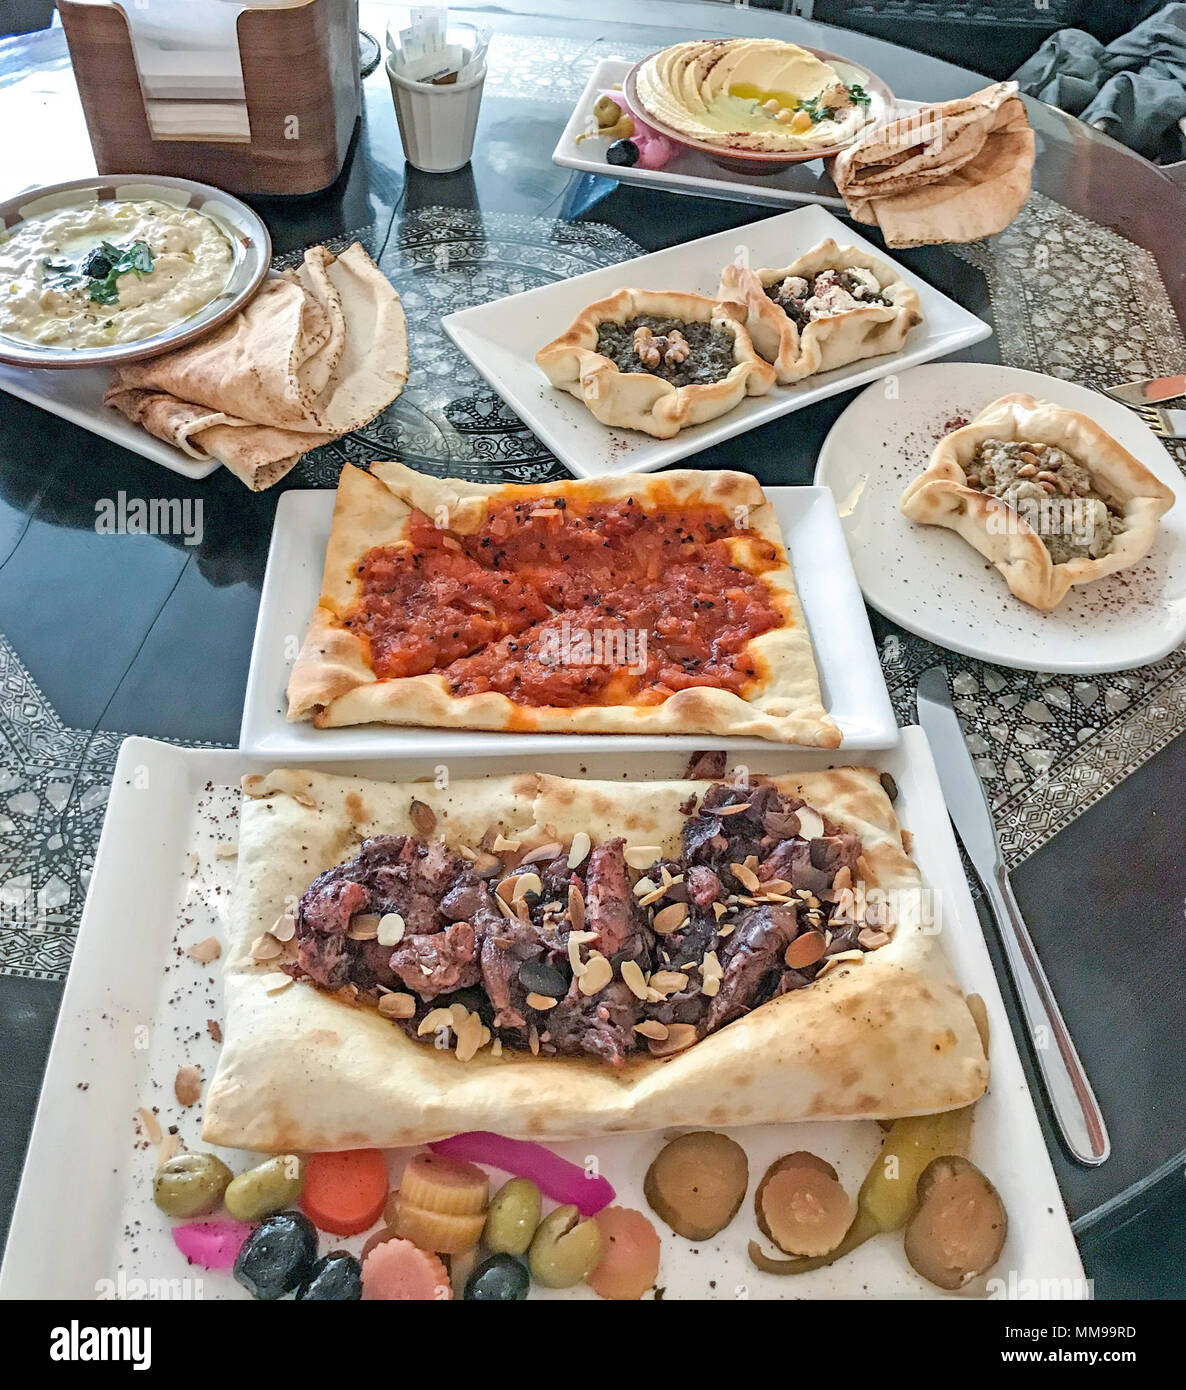 GoTonysmith,@HotpixUK,food,middle,east,eastern,cuisine,Syrian,Lebanon,Sunni,Shia,cooking,restaurant,cafe,Immigrant,bringing